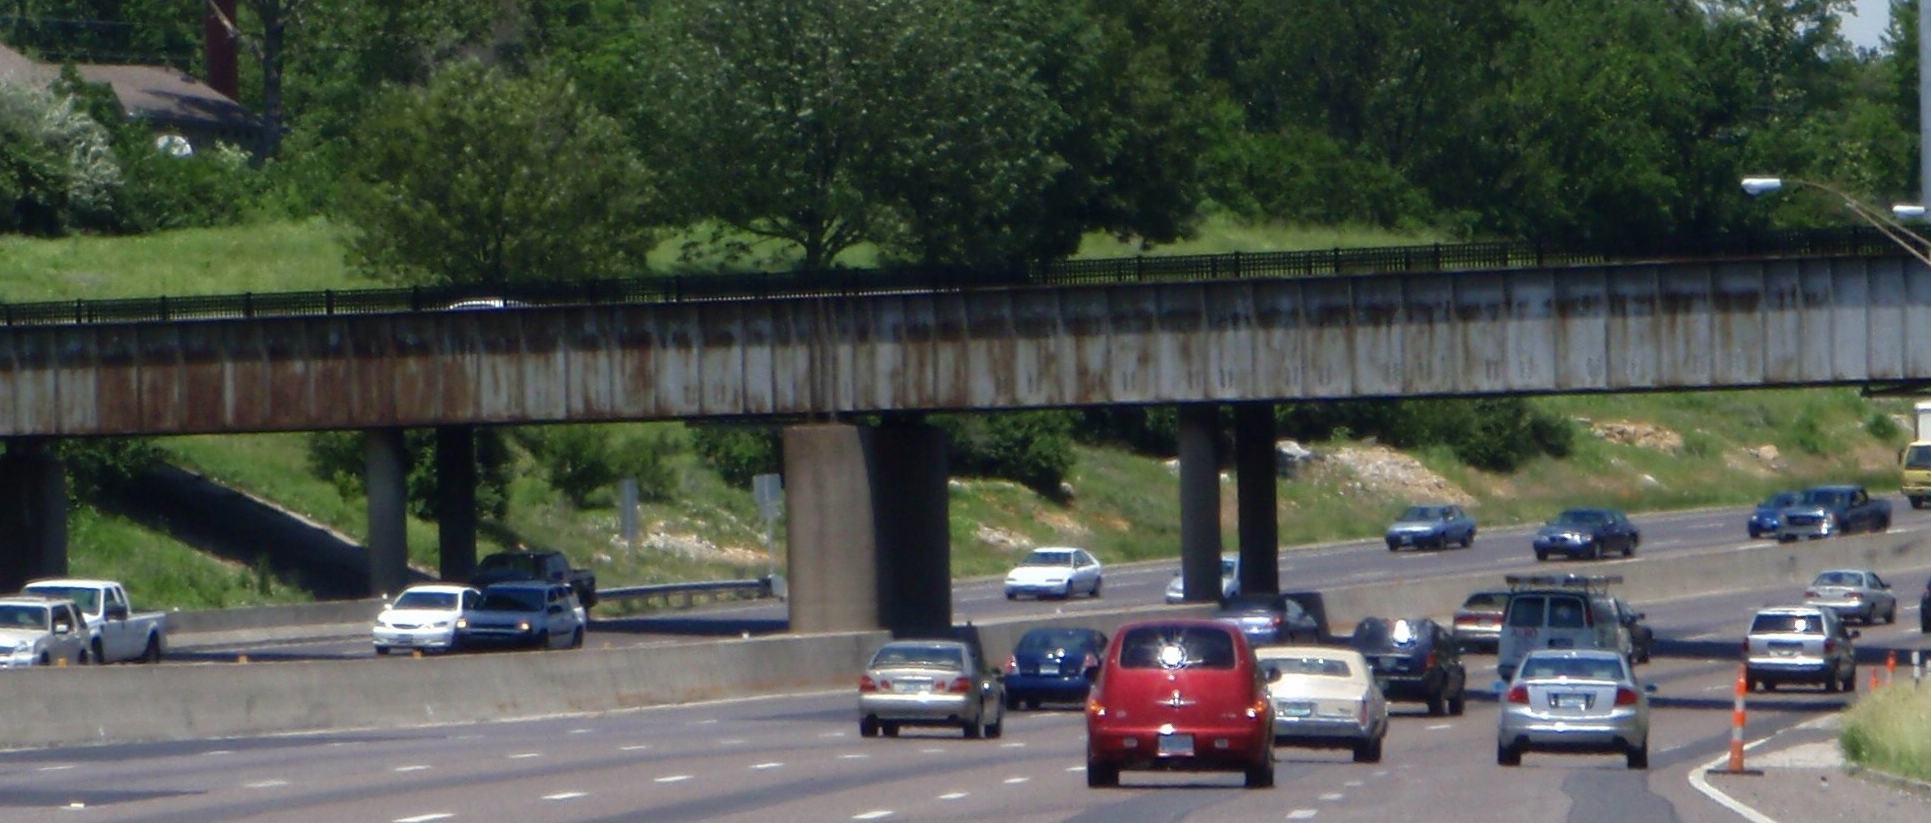 08001 Grants Trail Bridge Painting 02.png